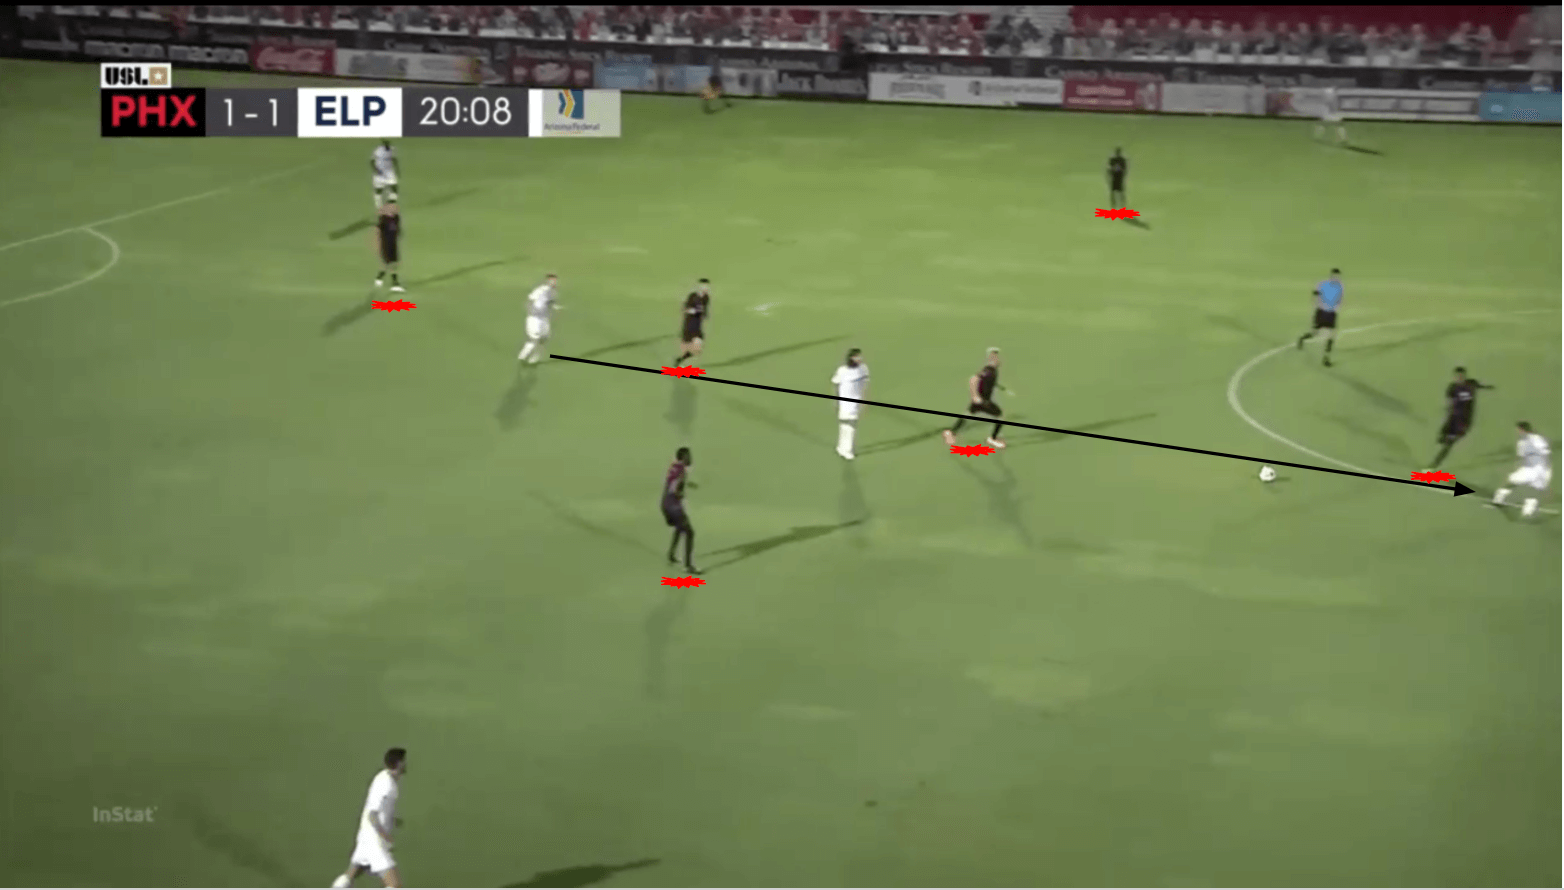 USL Championship 2020: Phoenix Rising vs El Paso Locomotive - tactical analysis tactics